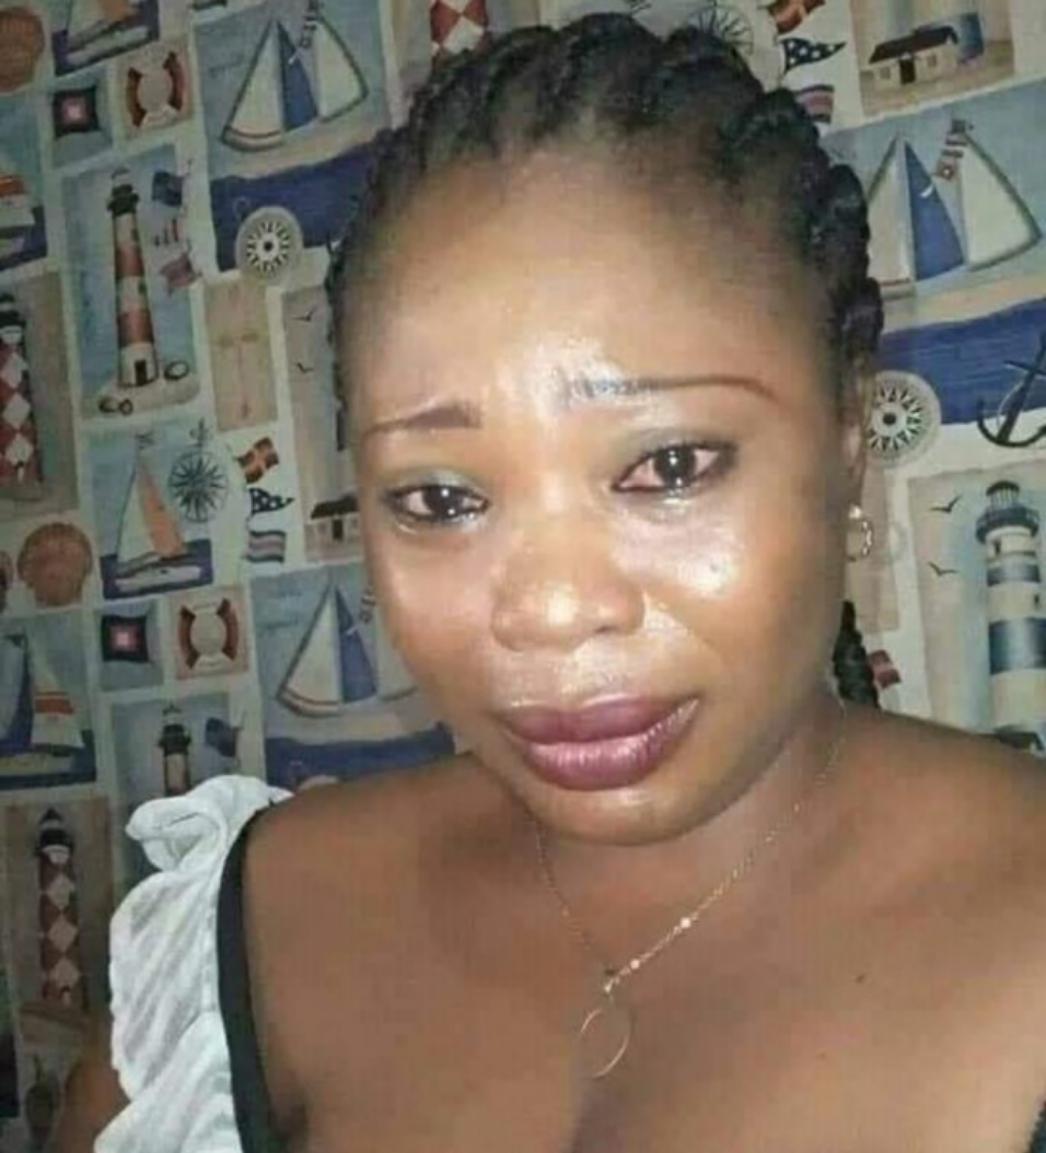 Very Sad: My husband set me up - Mother